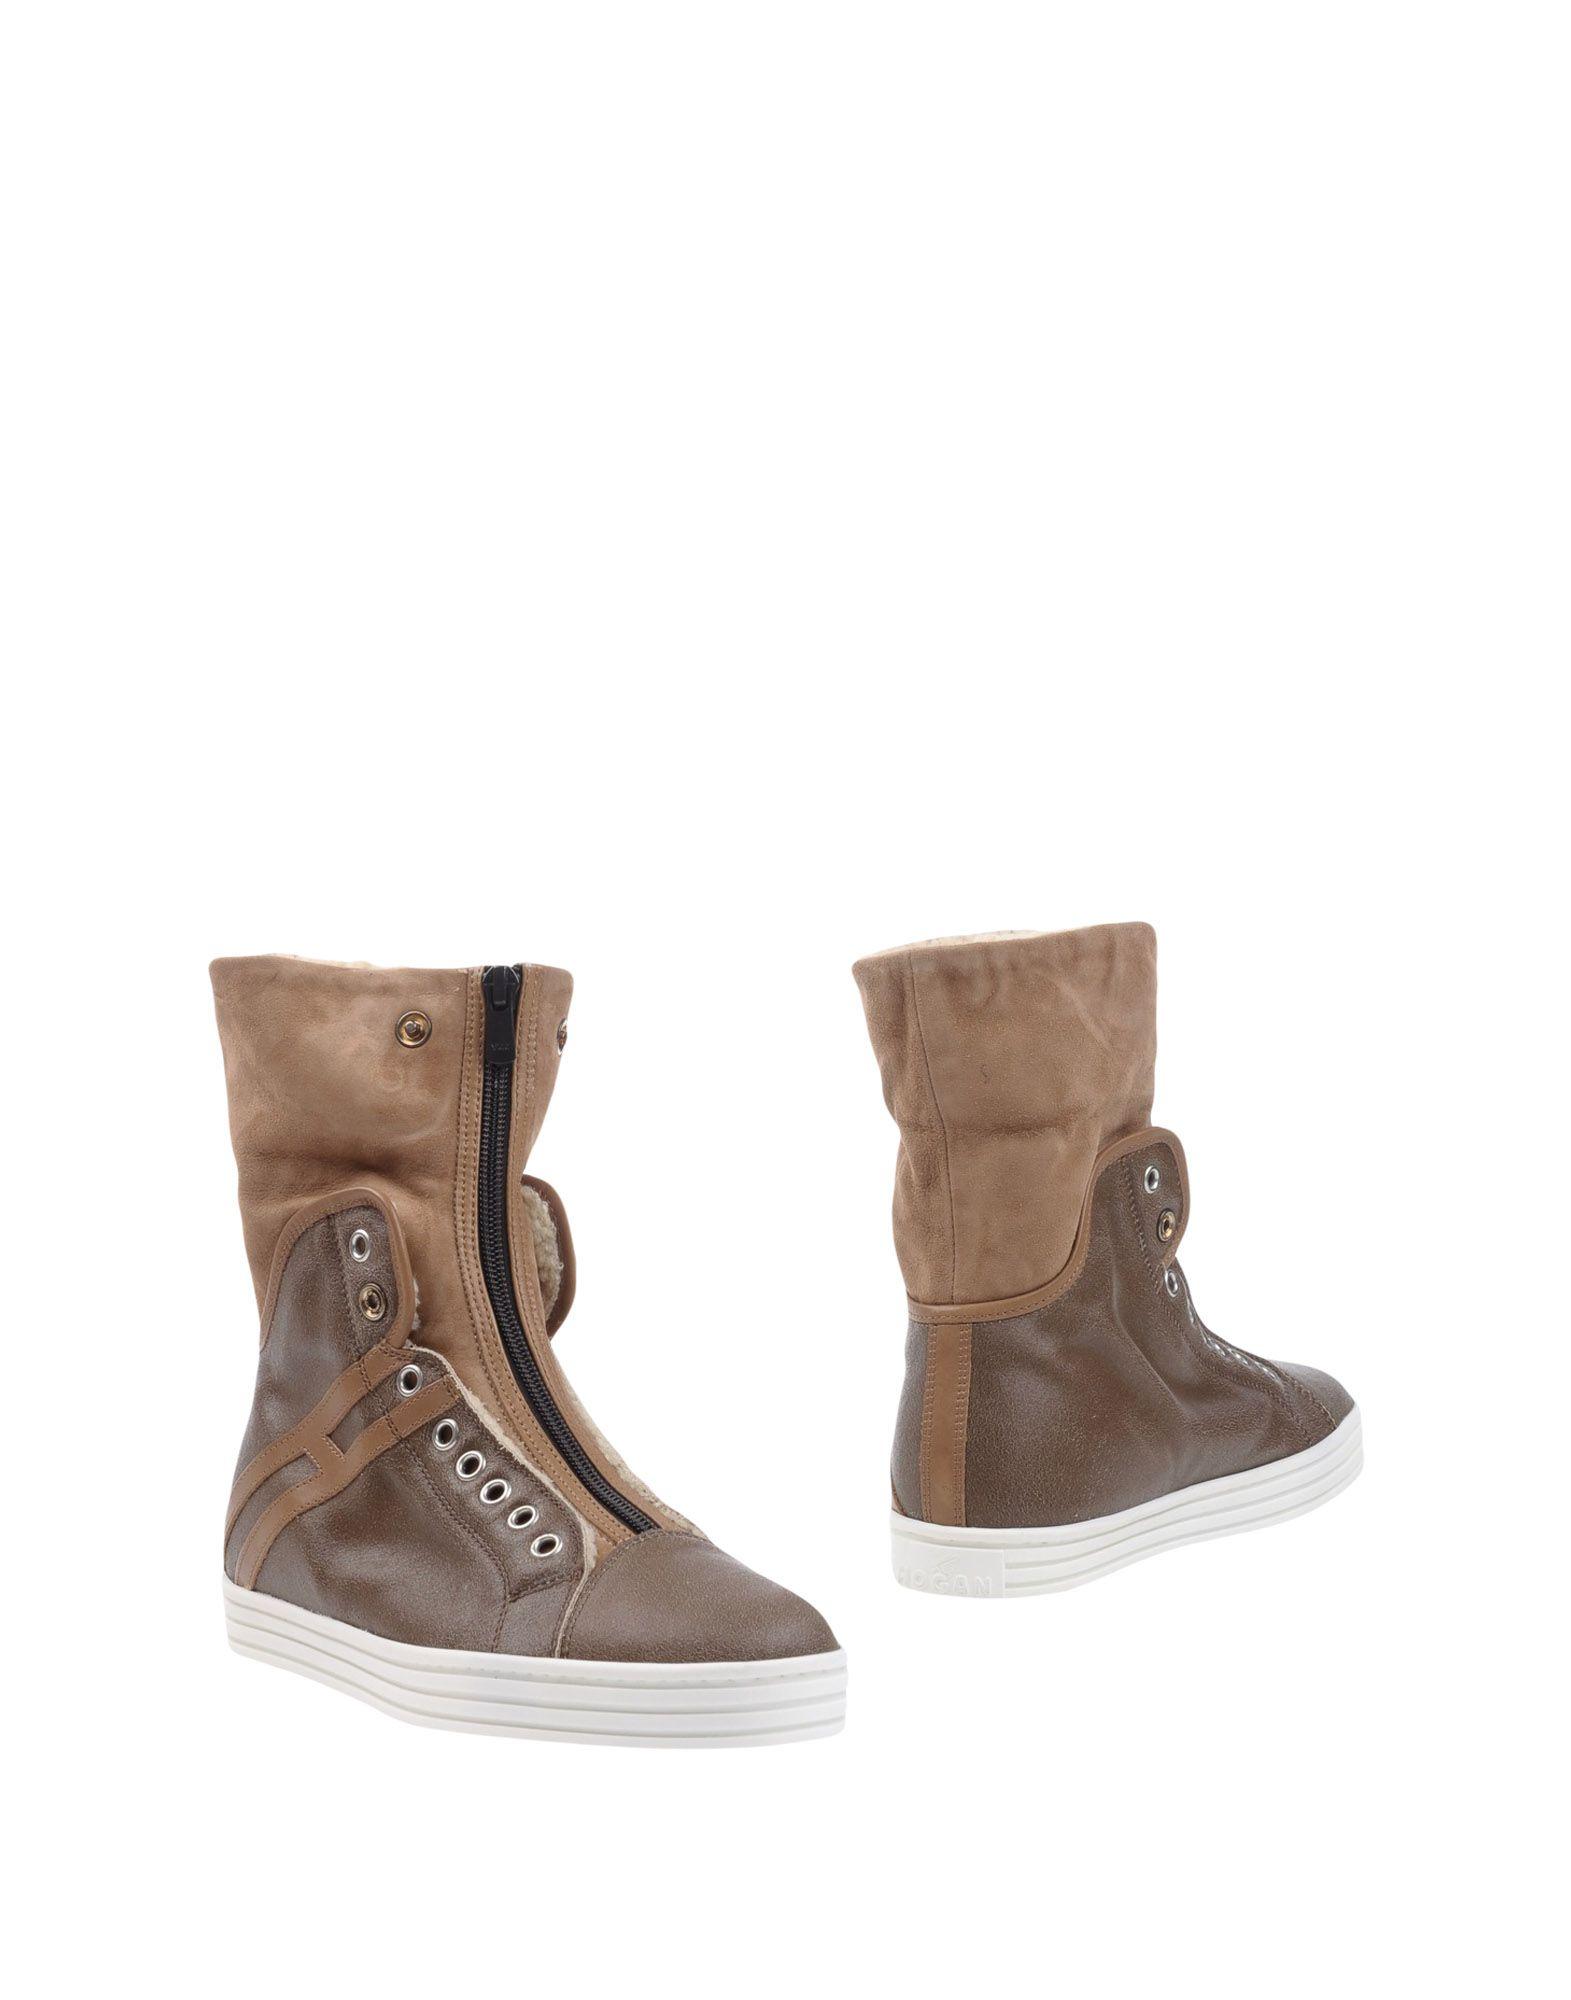 Hogan Rebel Stiefelette Schuhe Damen  11240859WV Neue Schuhe Stiefelette 394a79